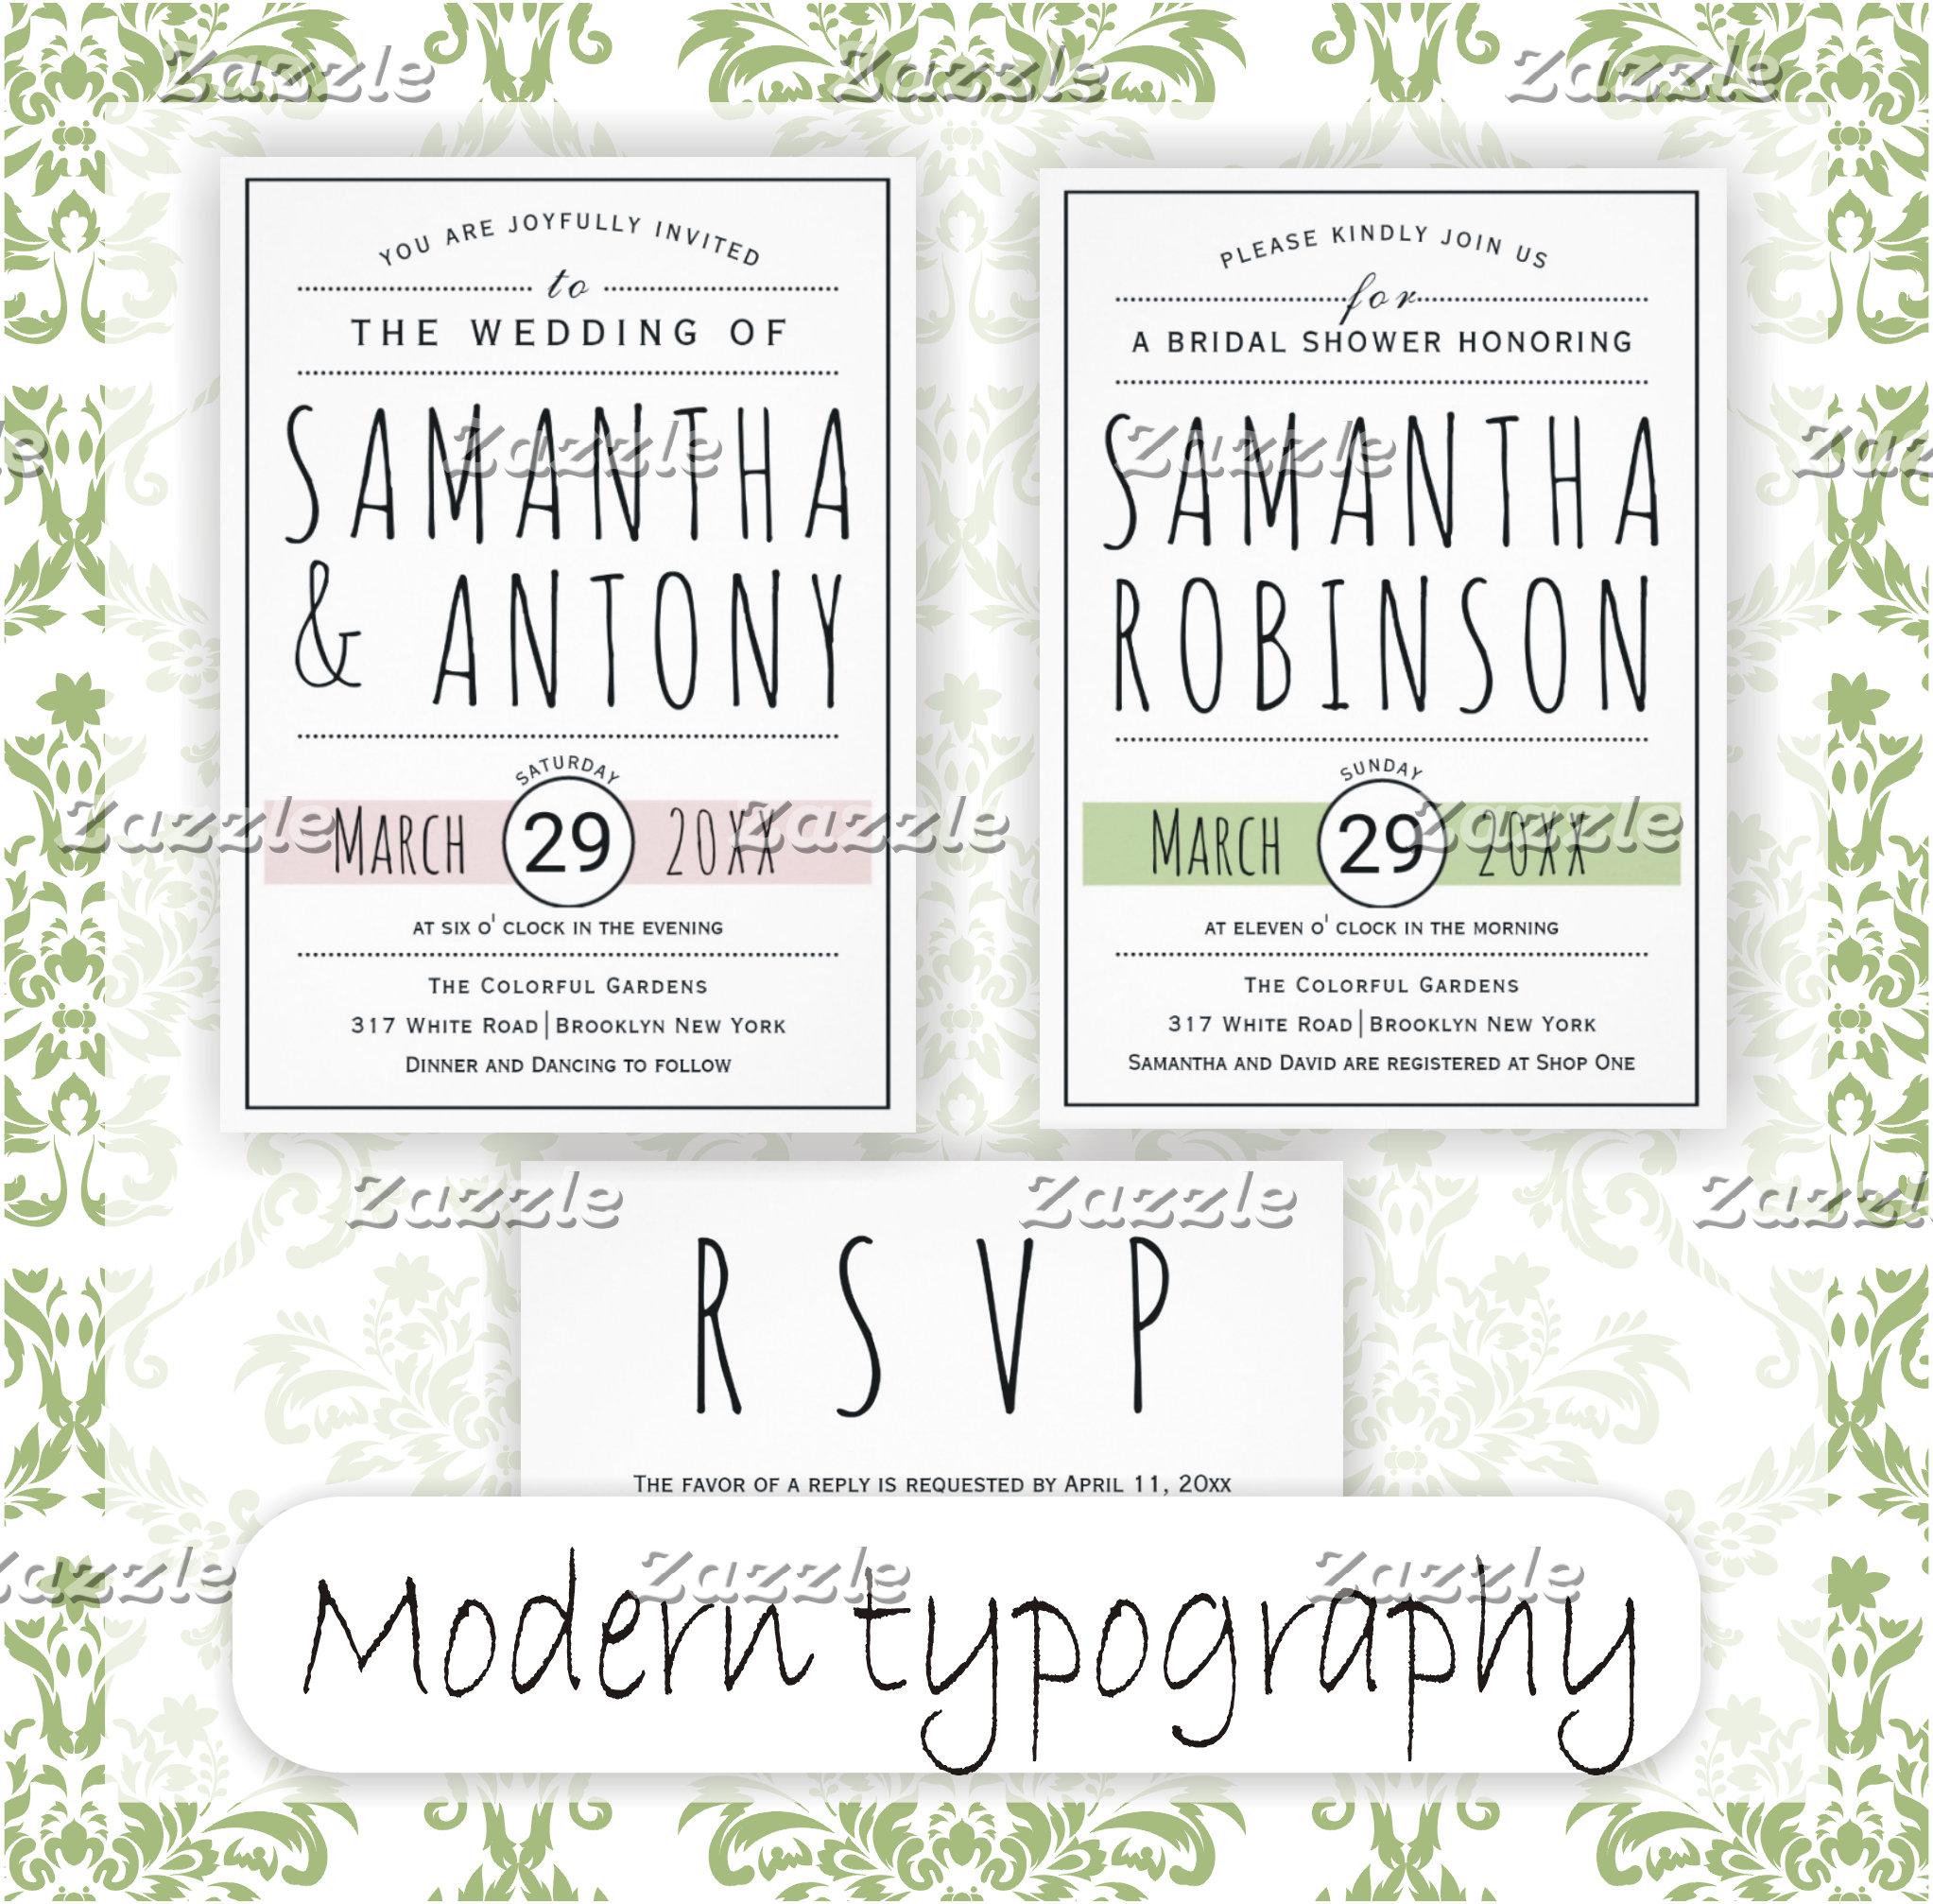 Modern typography